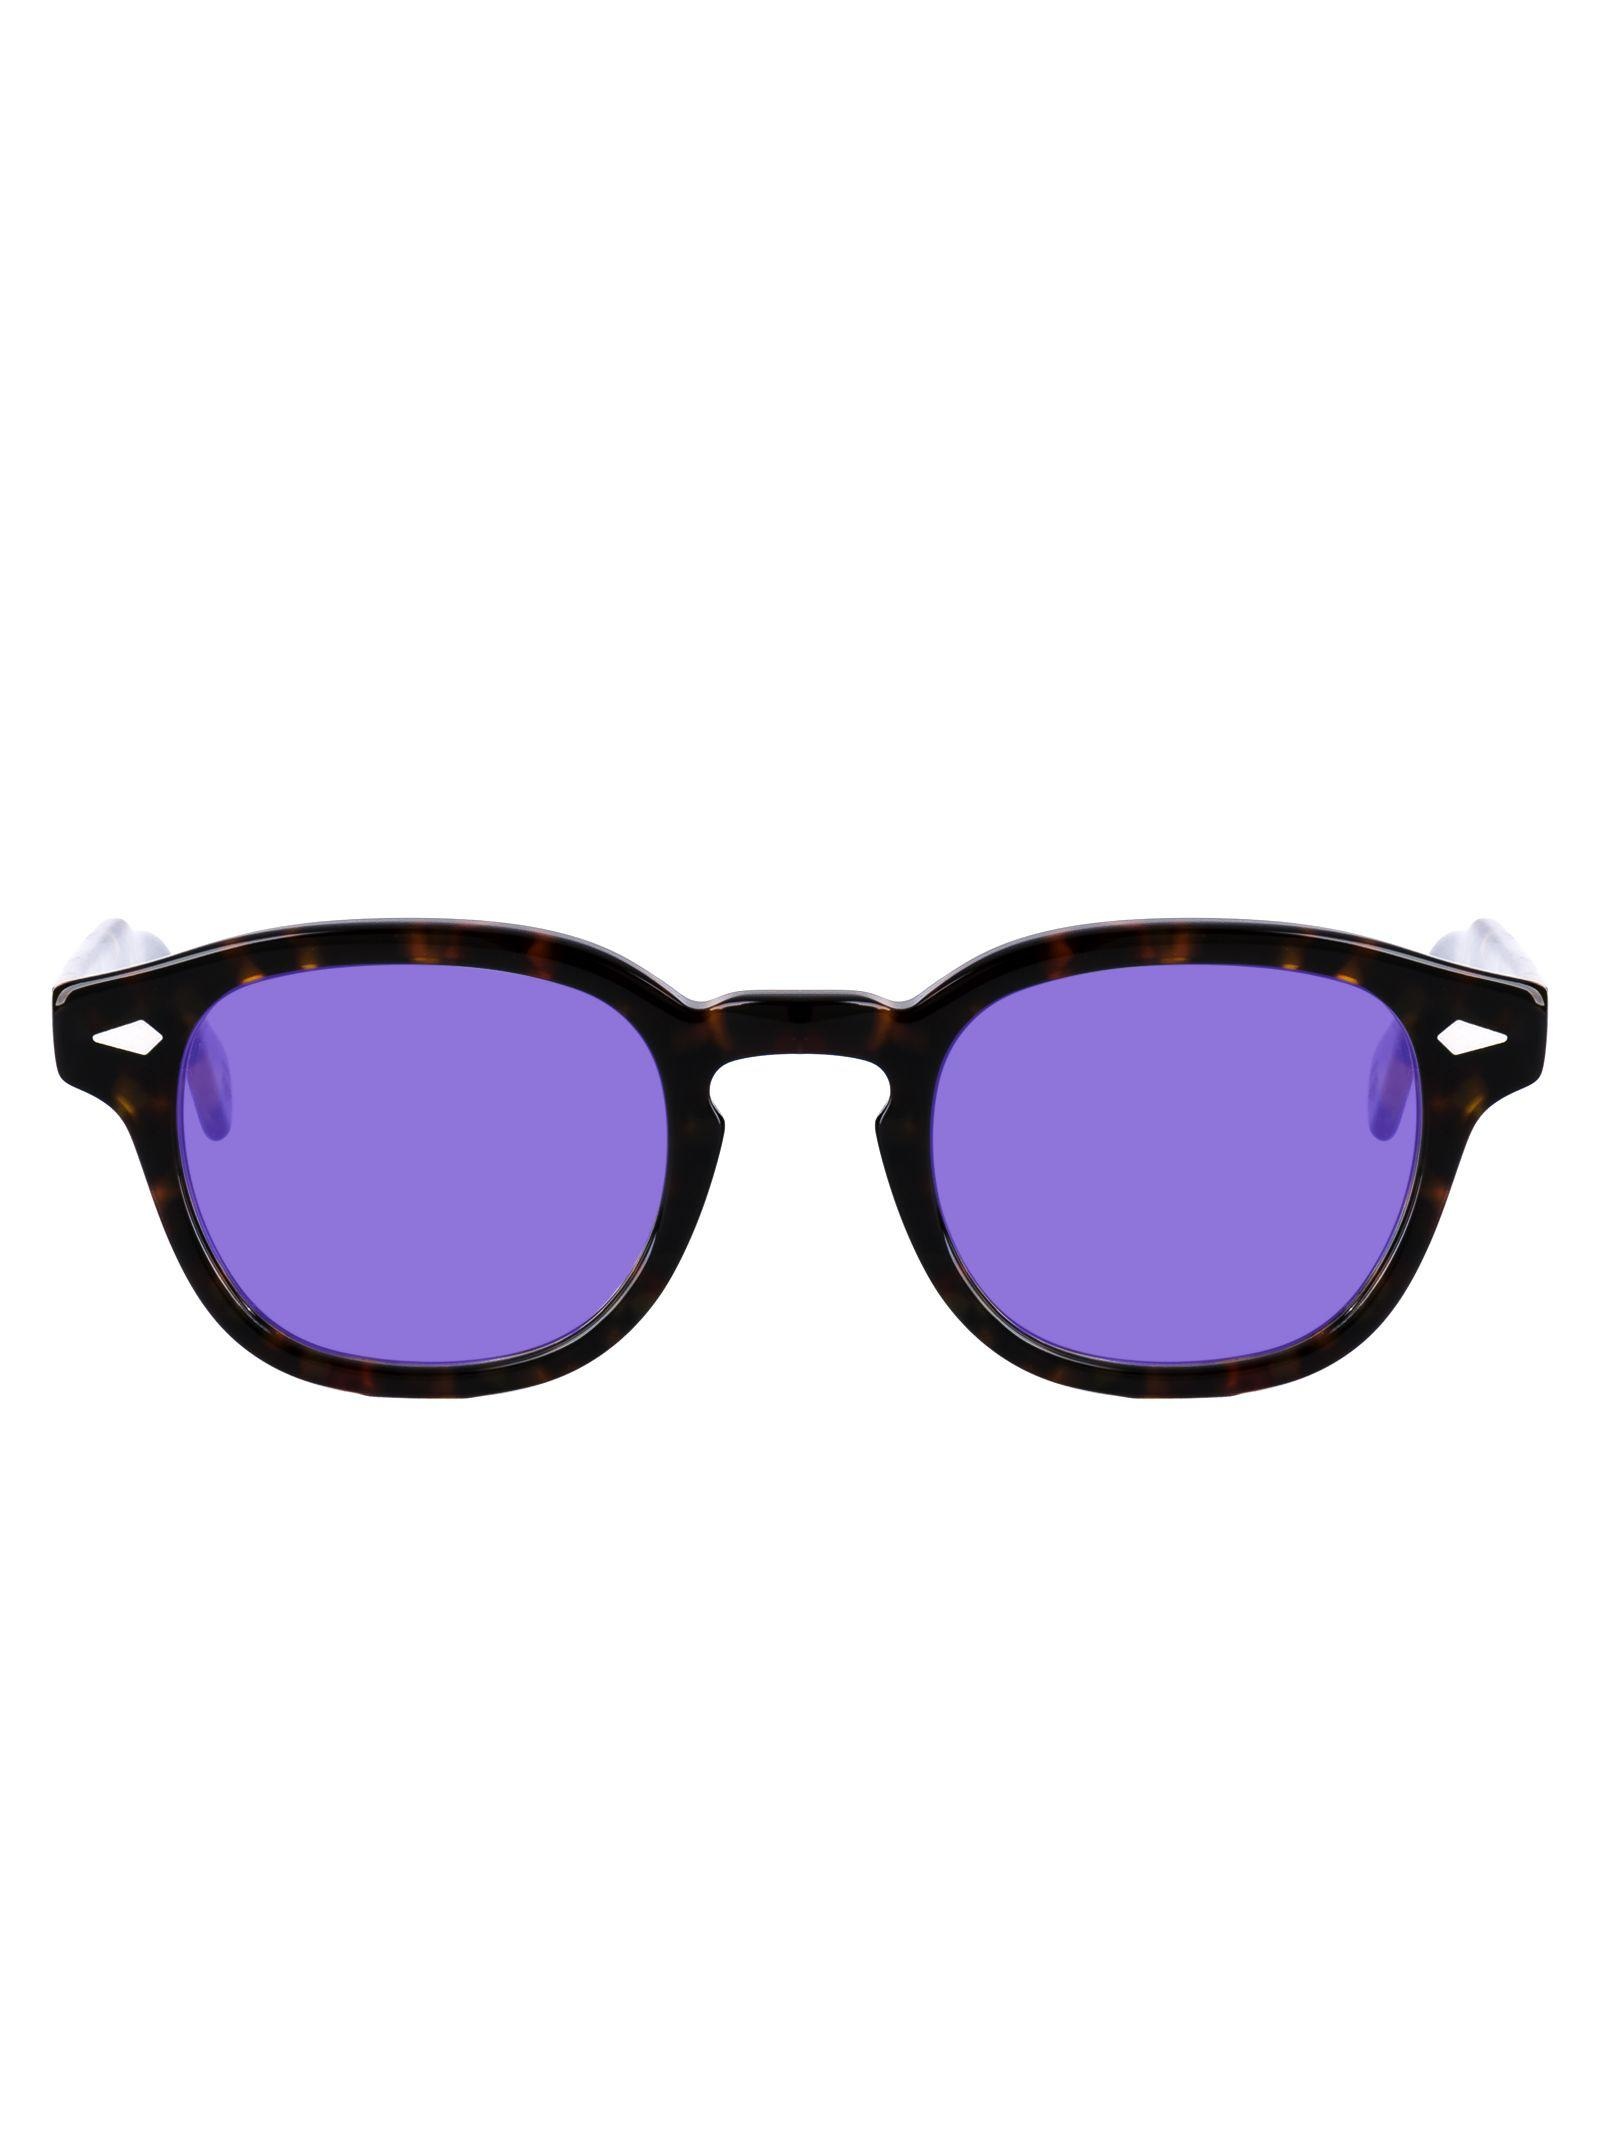 bb710a8972 Moscot Lemtosh Sunglasses In Tortoisepurple